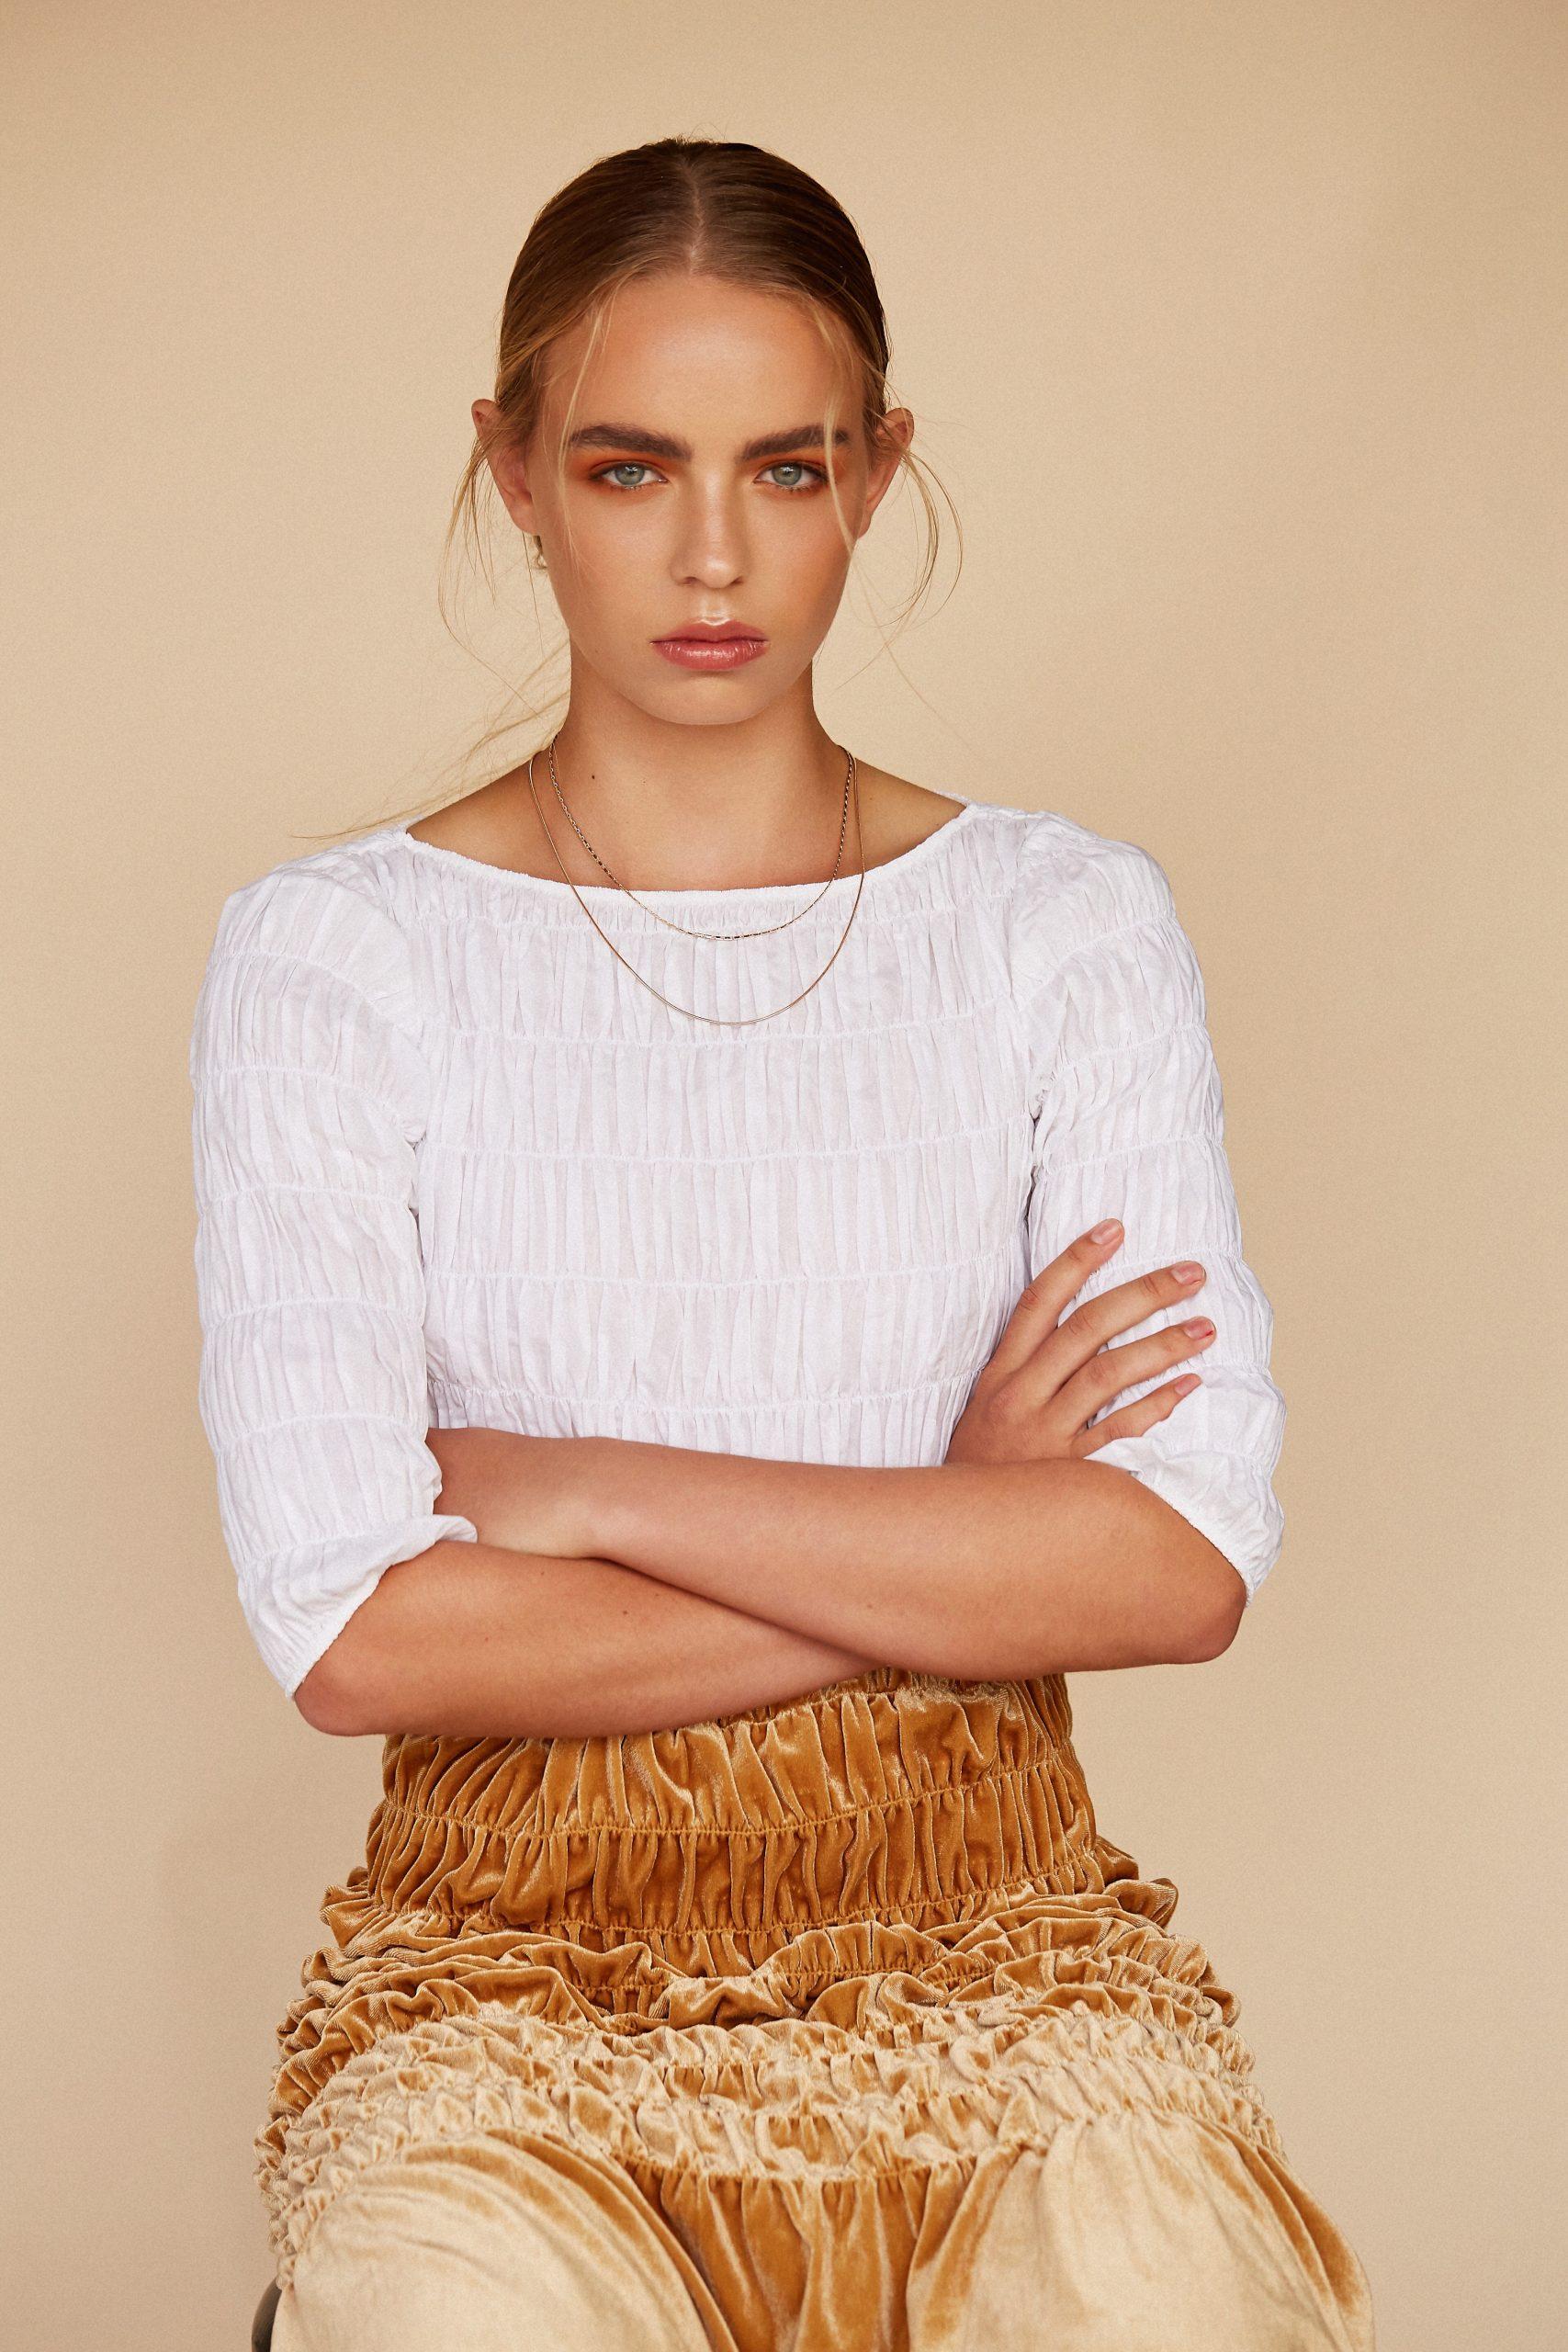 NEUE model Steph Potter shot by beauty photographer Chantelle Kemkemian